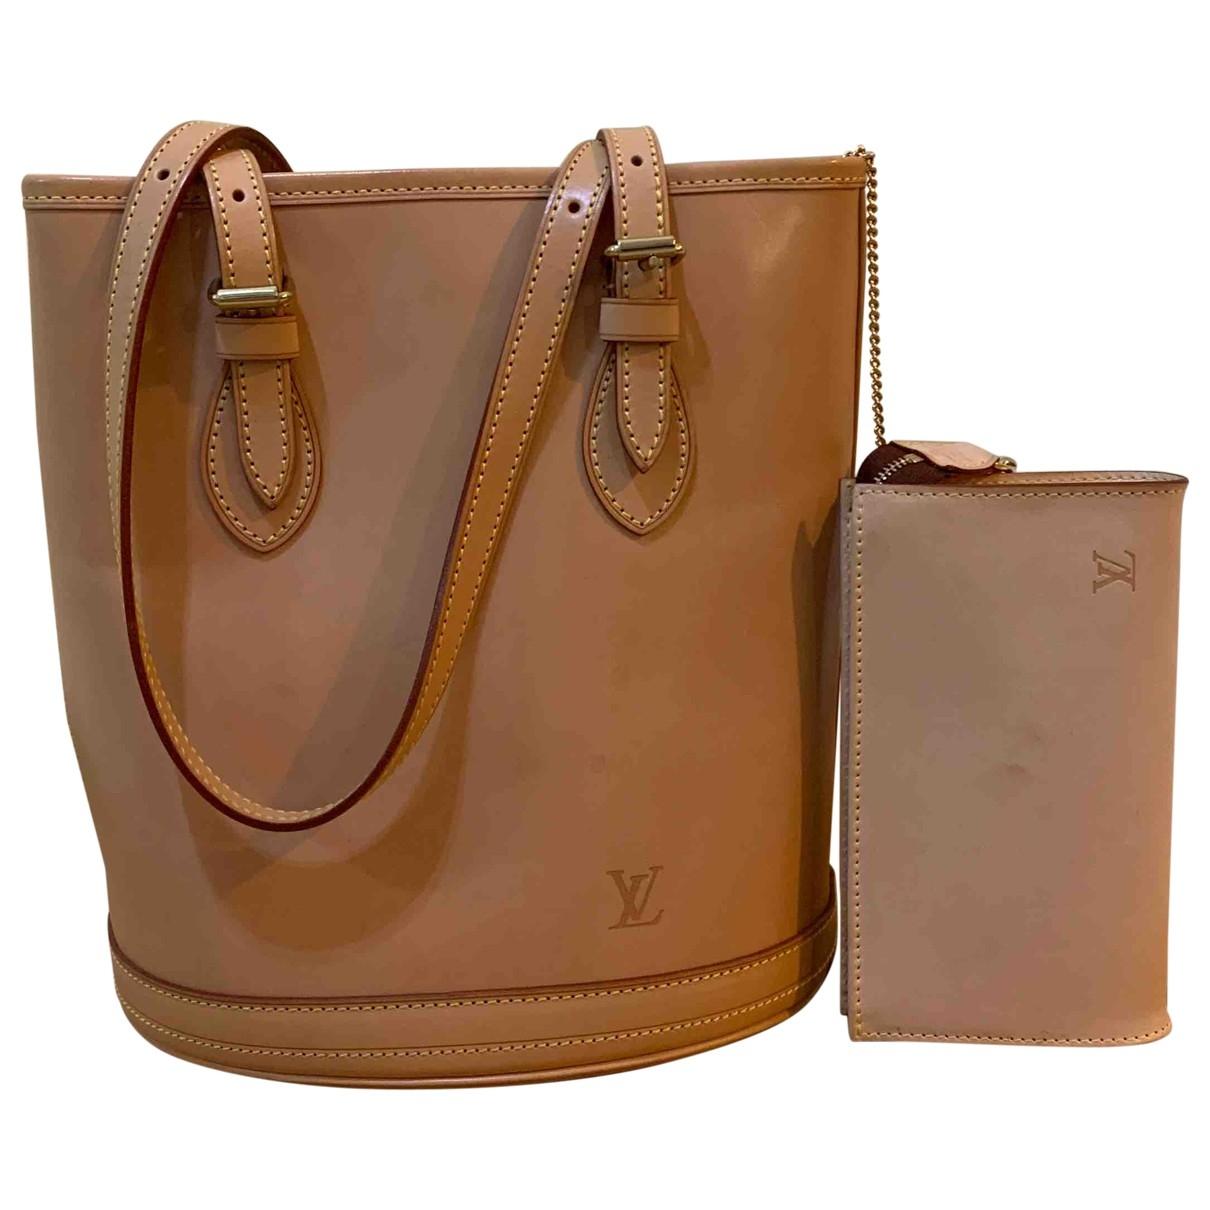 Louis Vuitton Bucket  Beige Leather handbag for Women \N